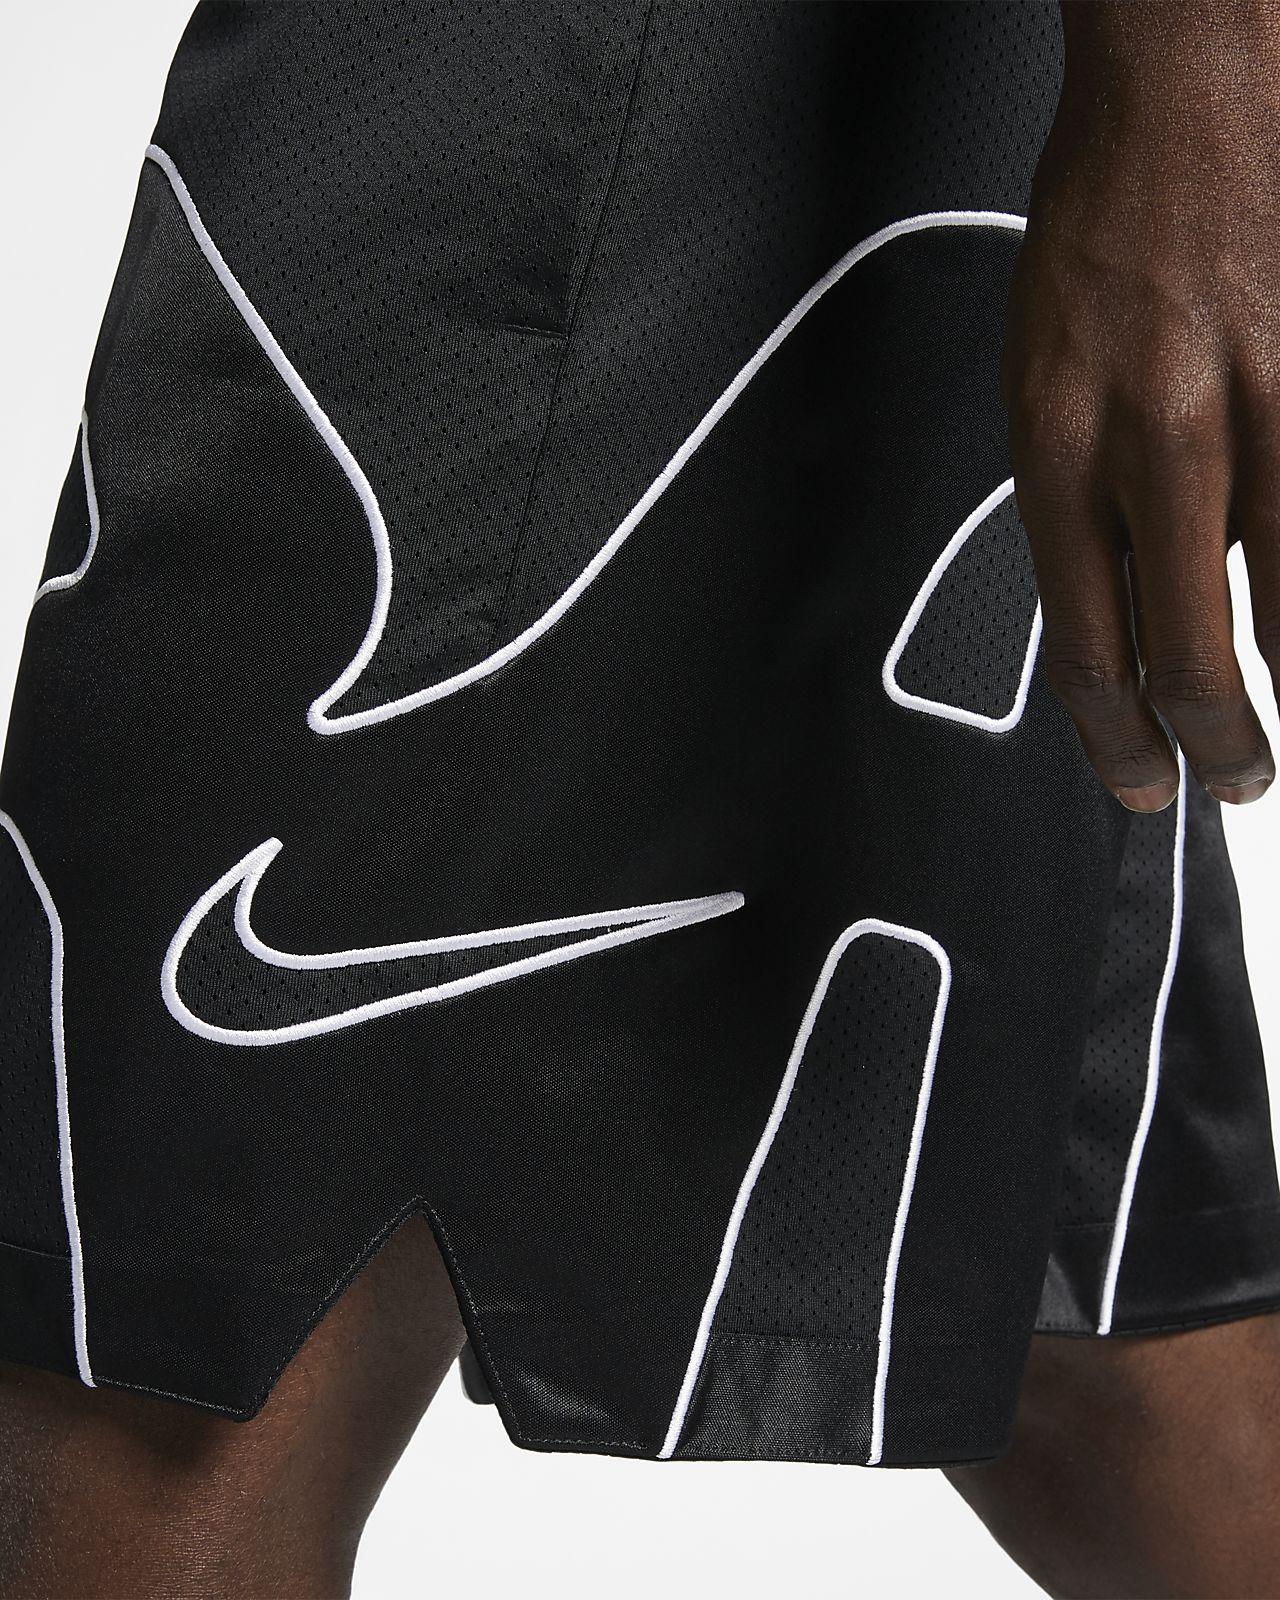 549b88b3f03 Nike DNA Men's Mesh Basketball Shorts. Nike.com